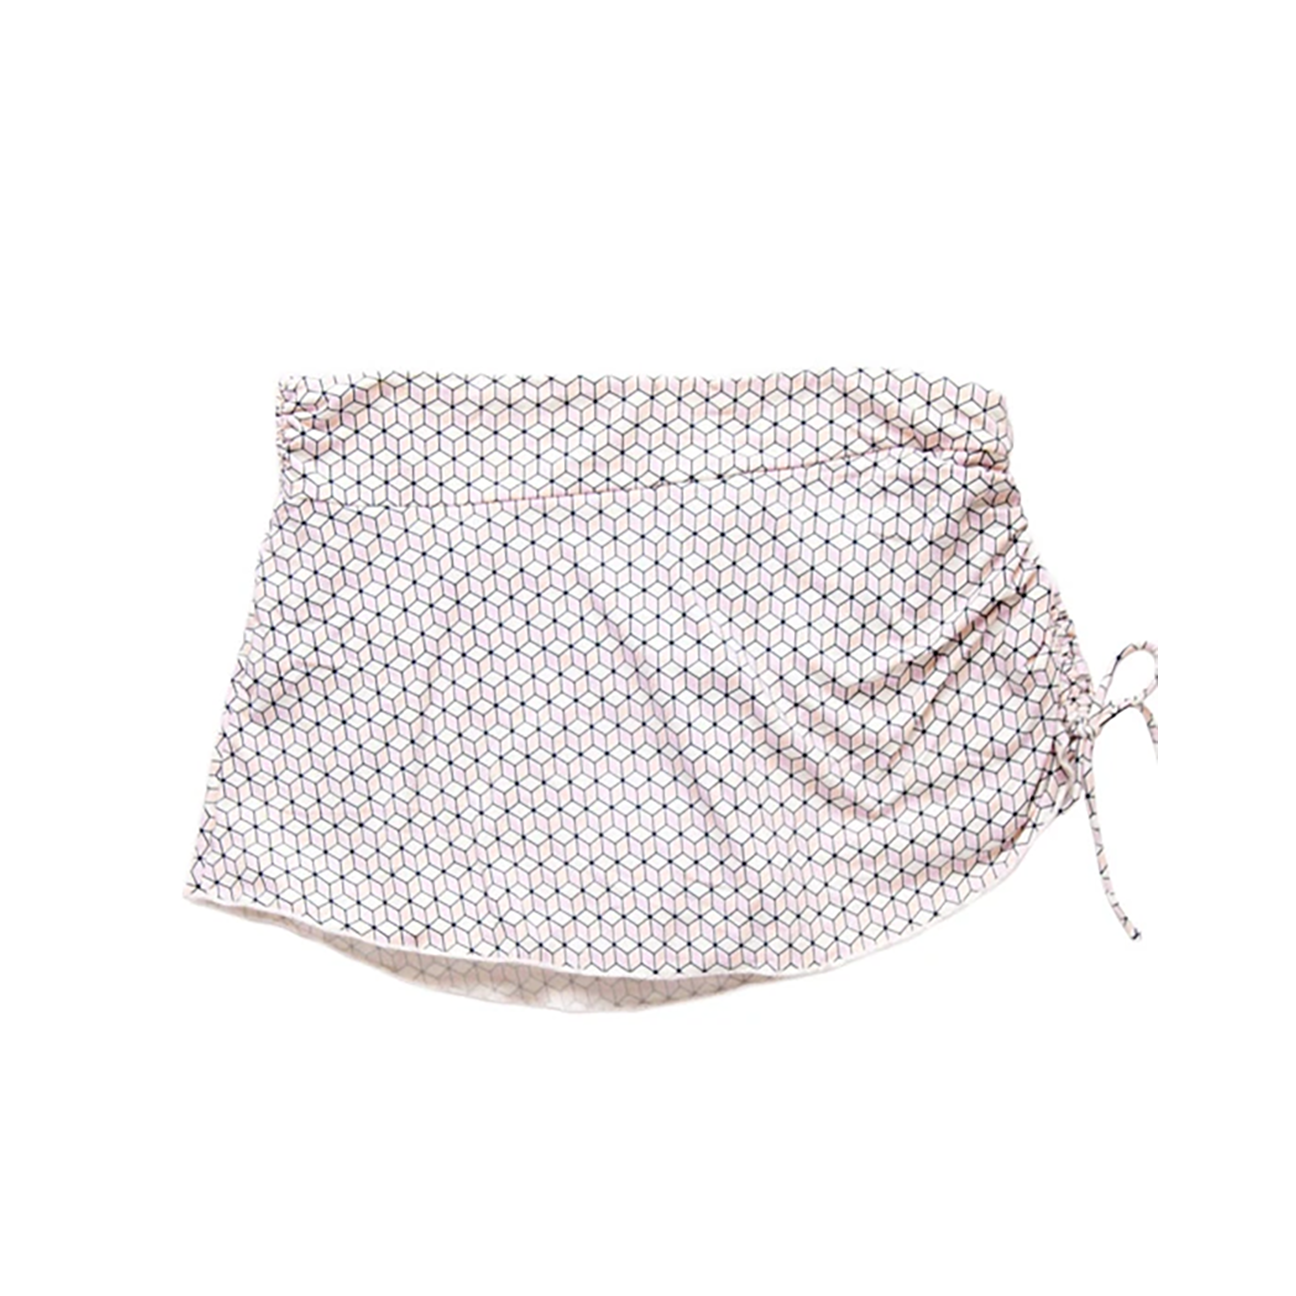 Hoku Swim Skirt: Paige-1